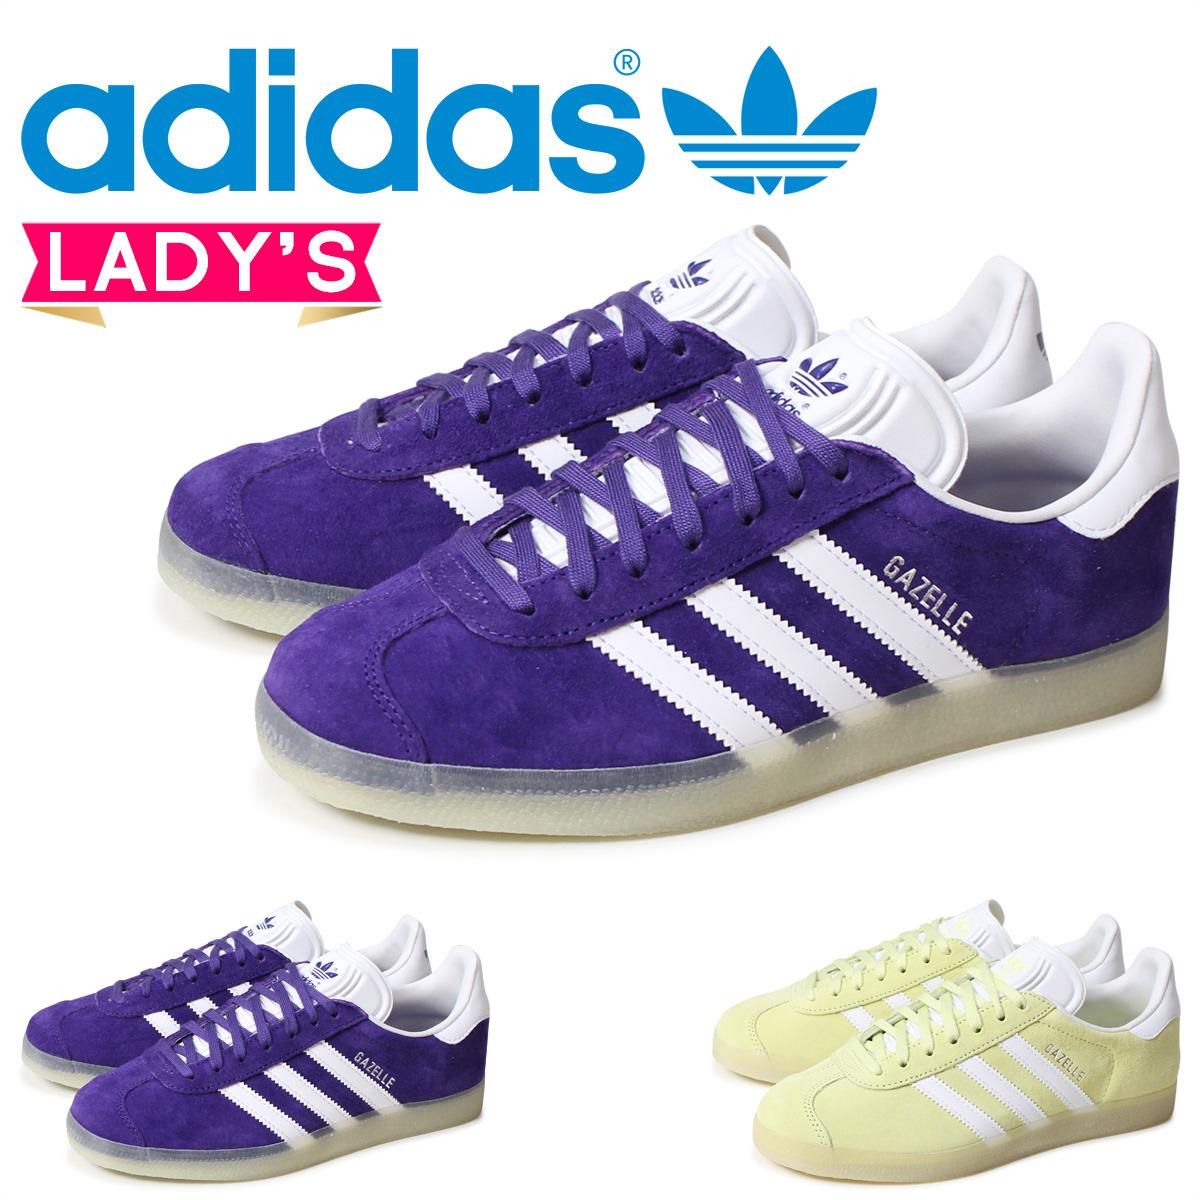 Damen Sneaker Adidas Gazelle Women Schuhe Damen Originals